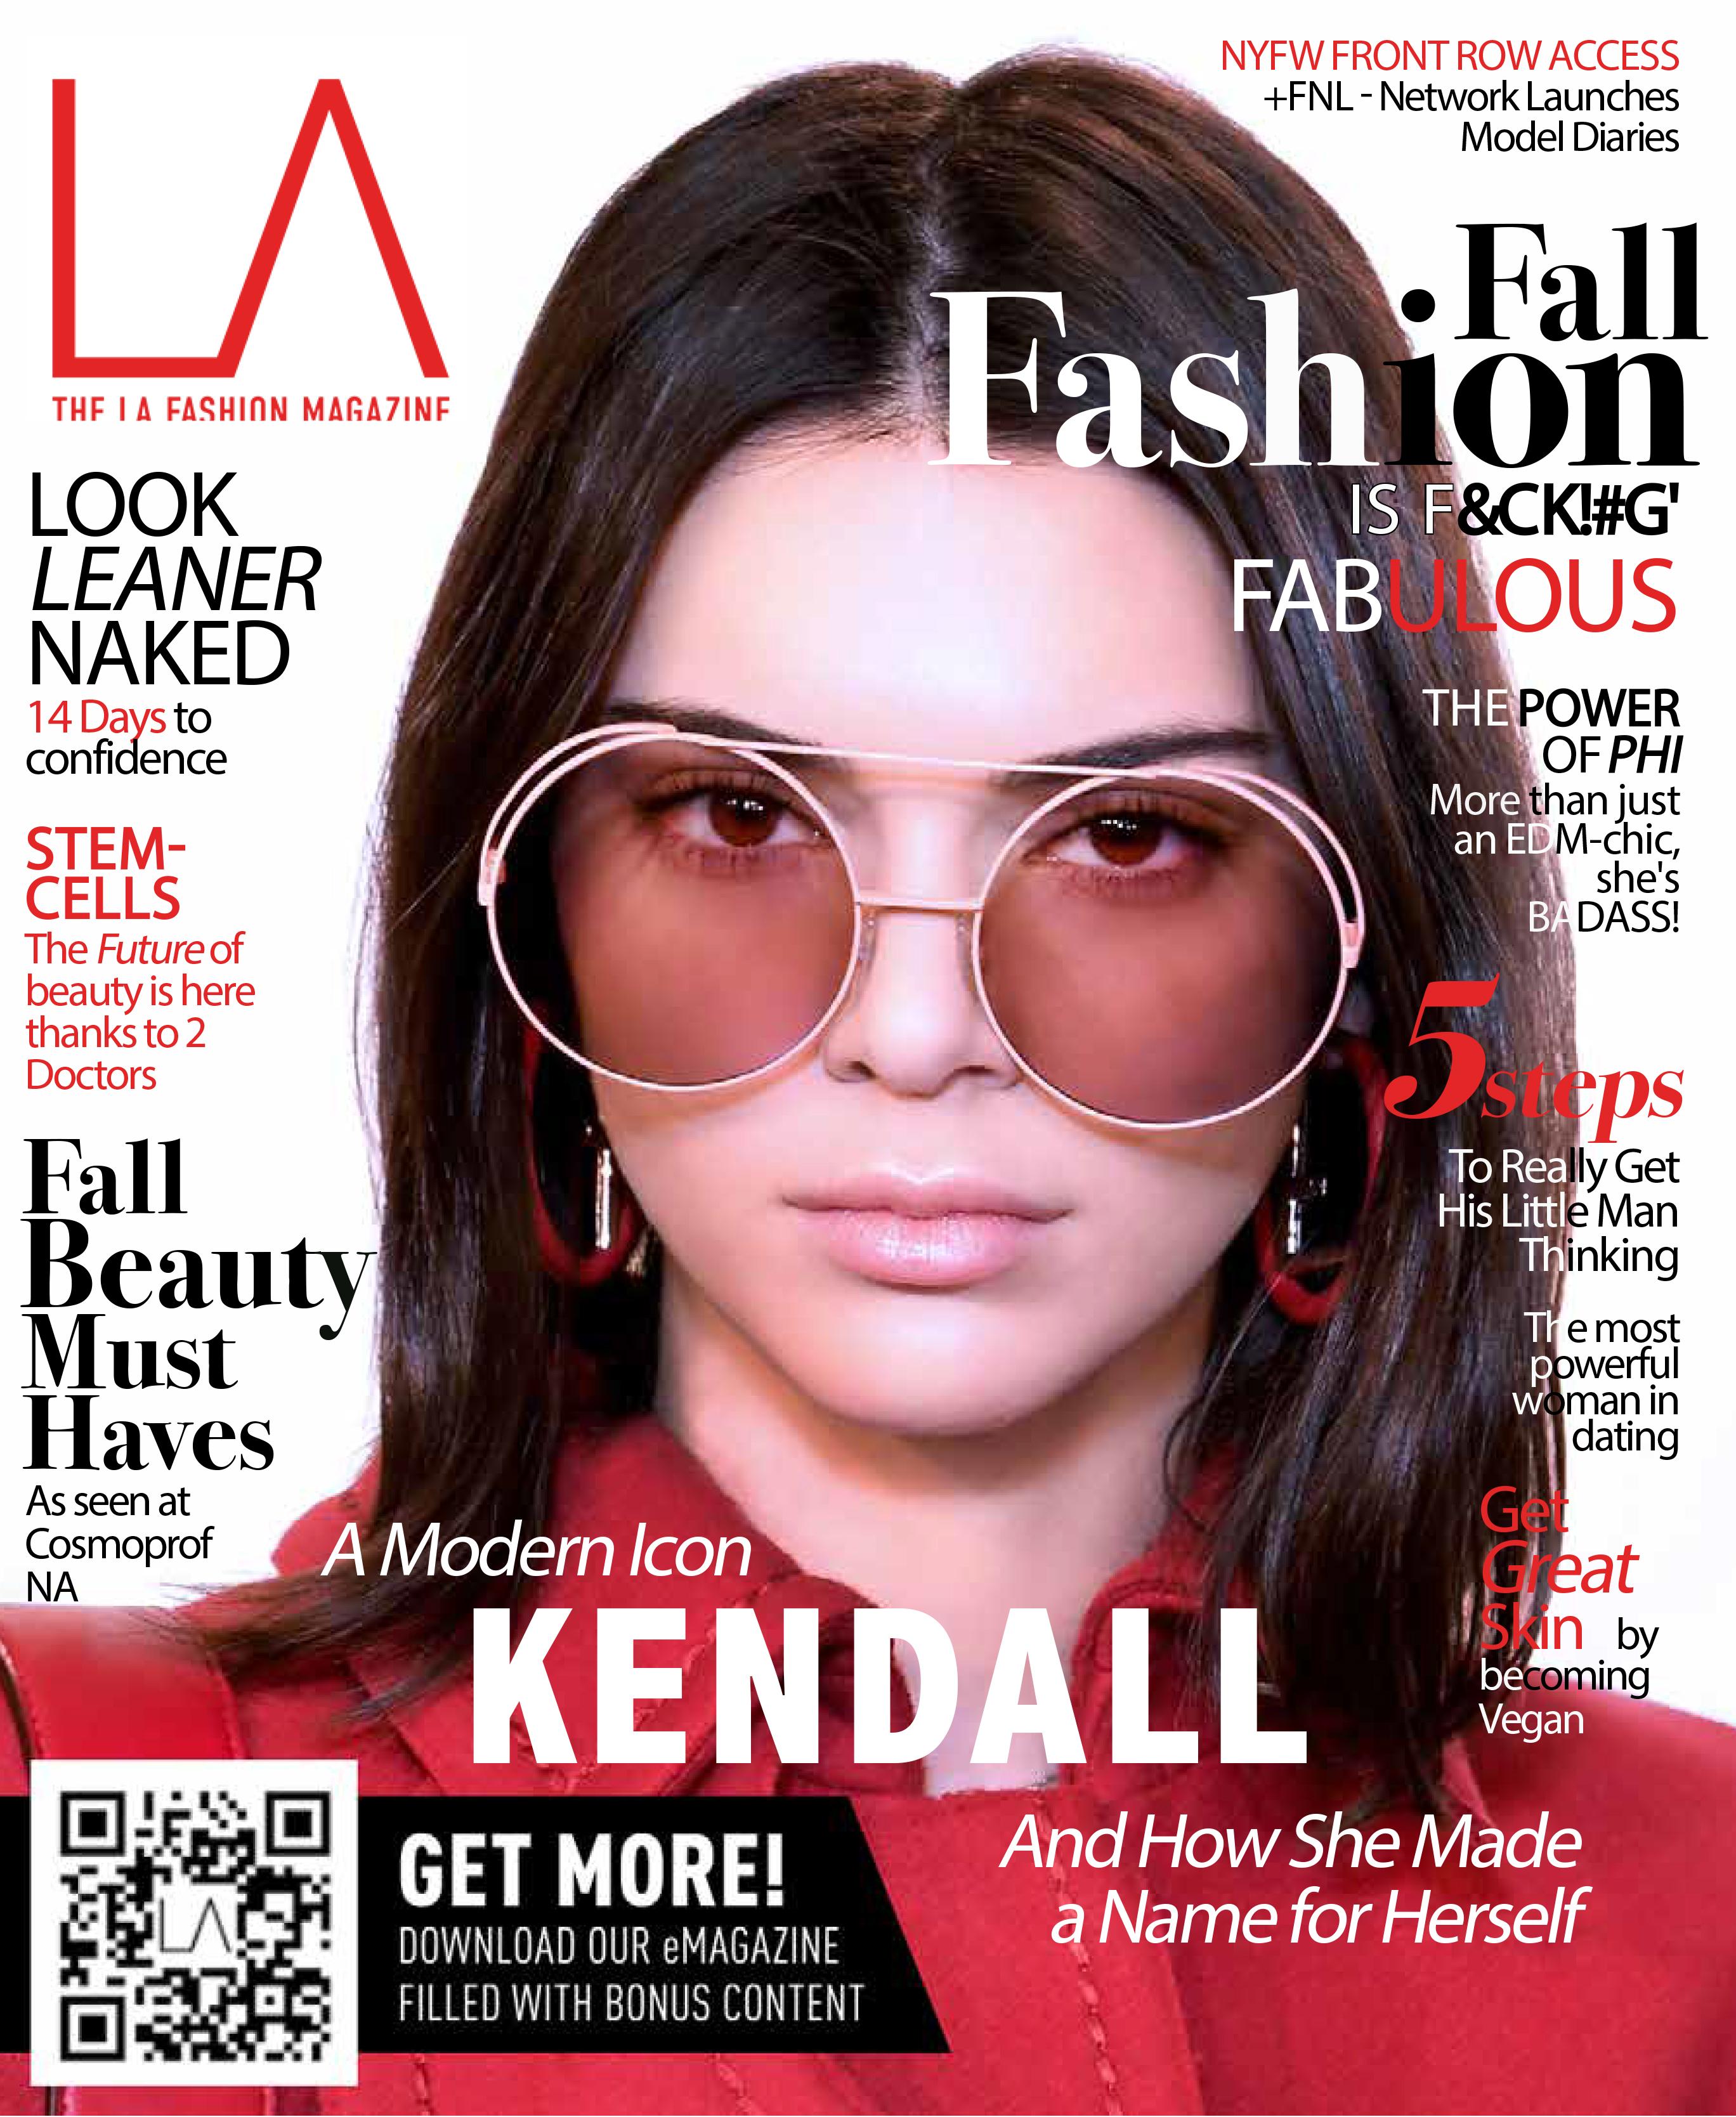 Top 10 Online Fashion Magazines Fashion-Tech BoF 44